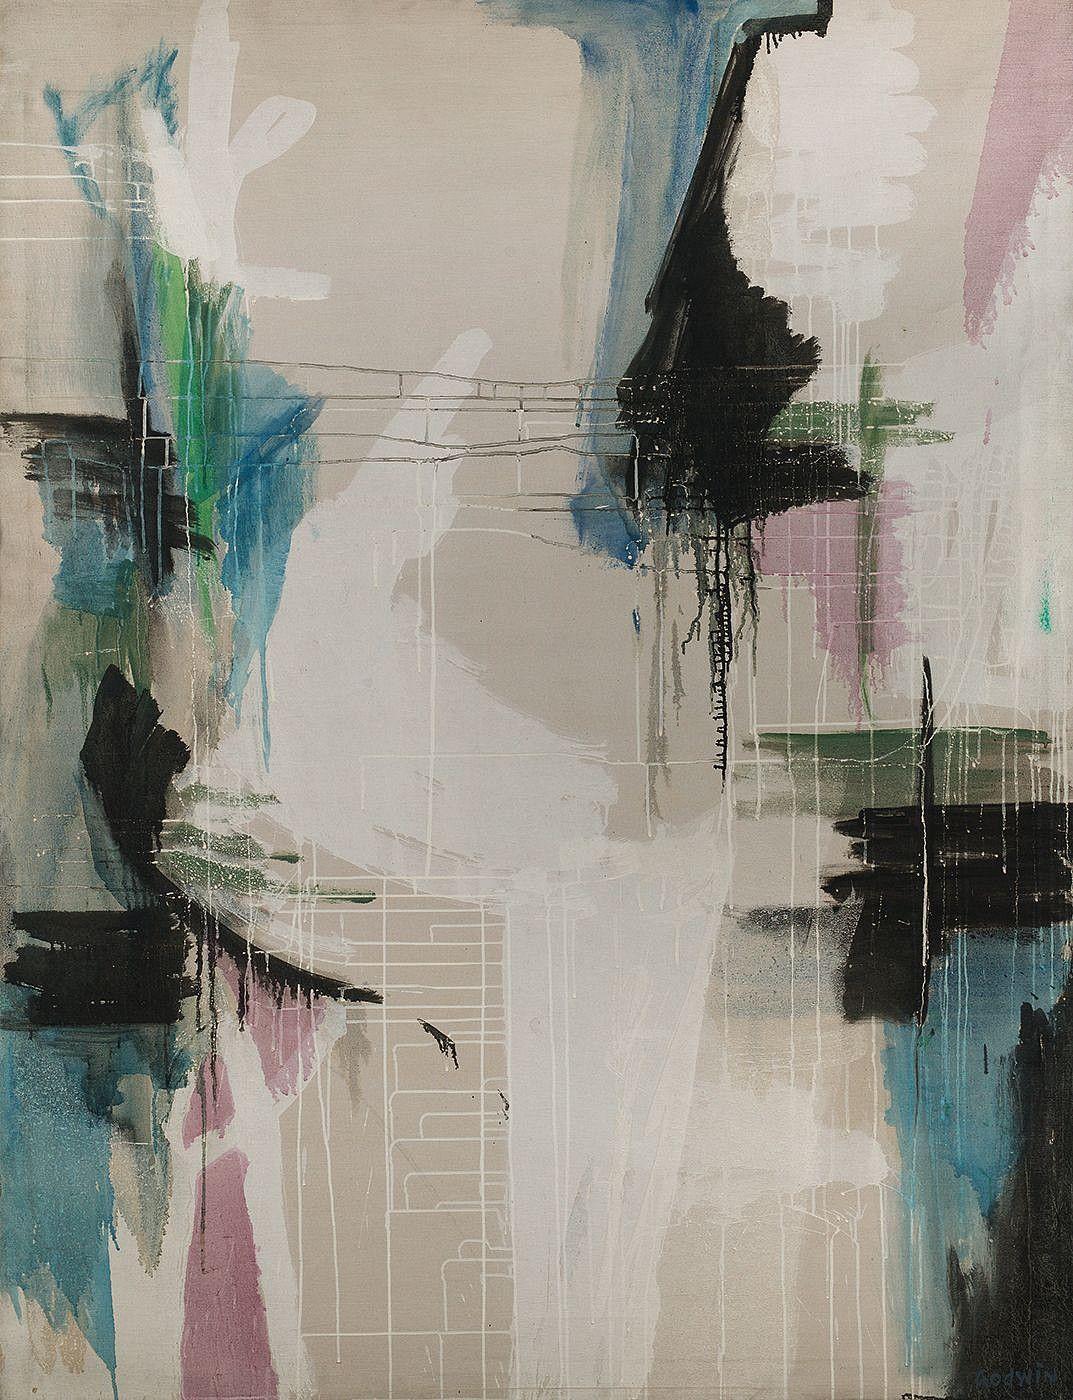 Judith Godwin, Abstraction No. 15 1955, Oil on canvas